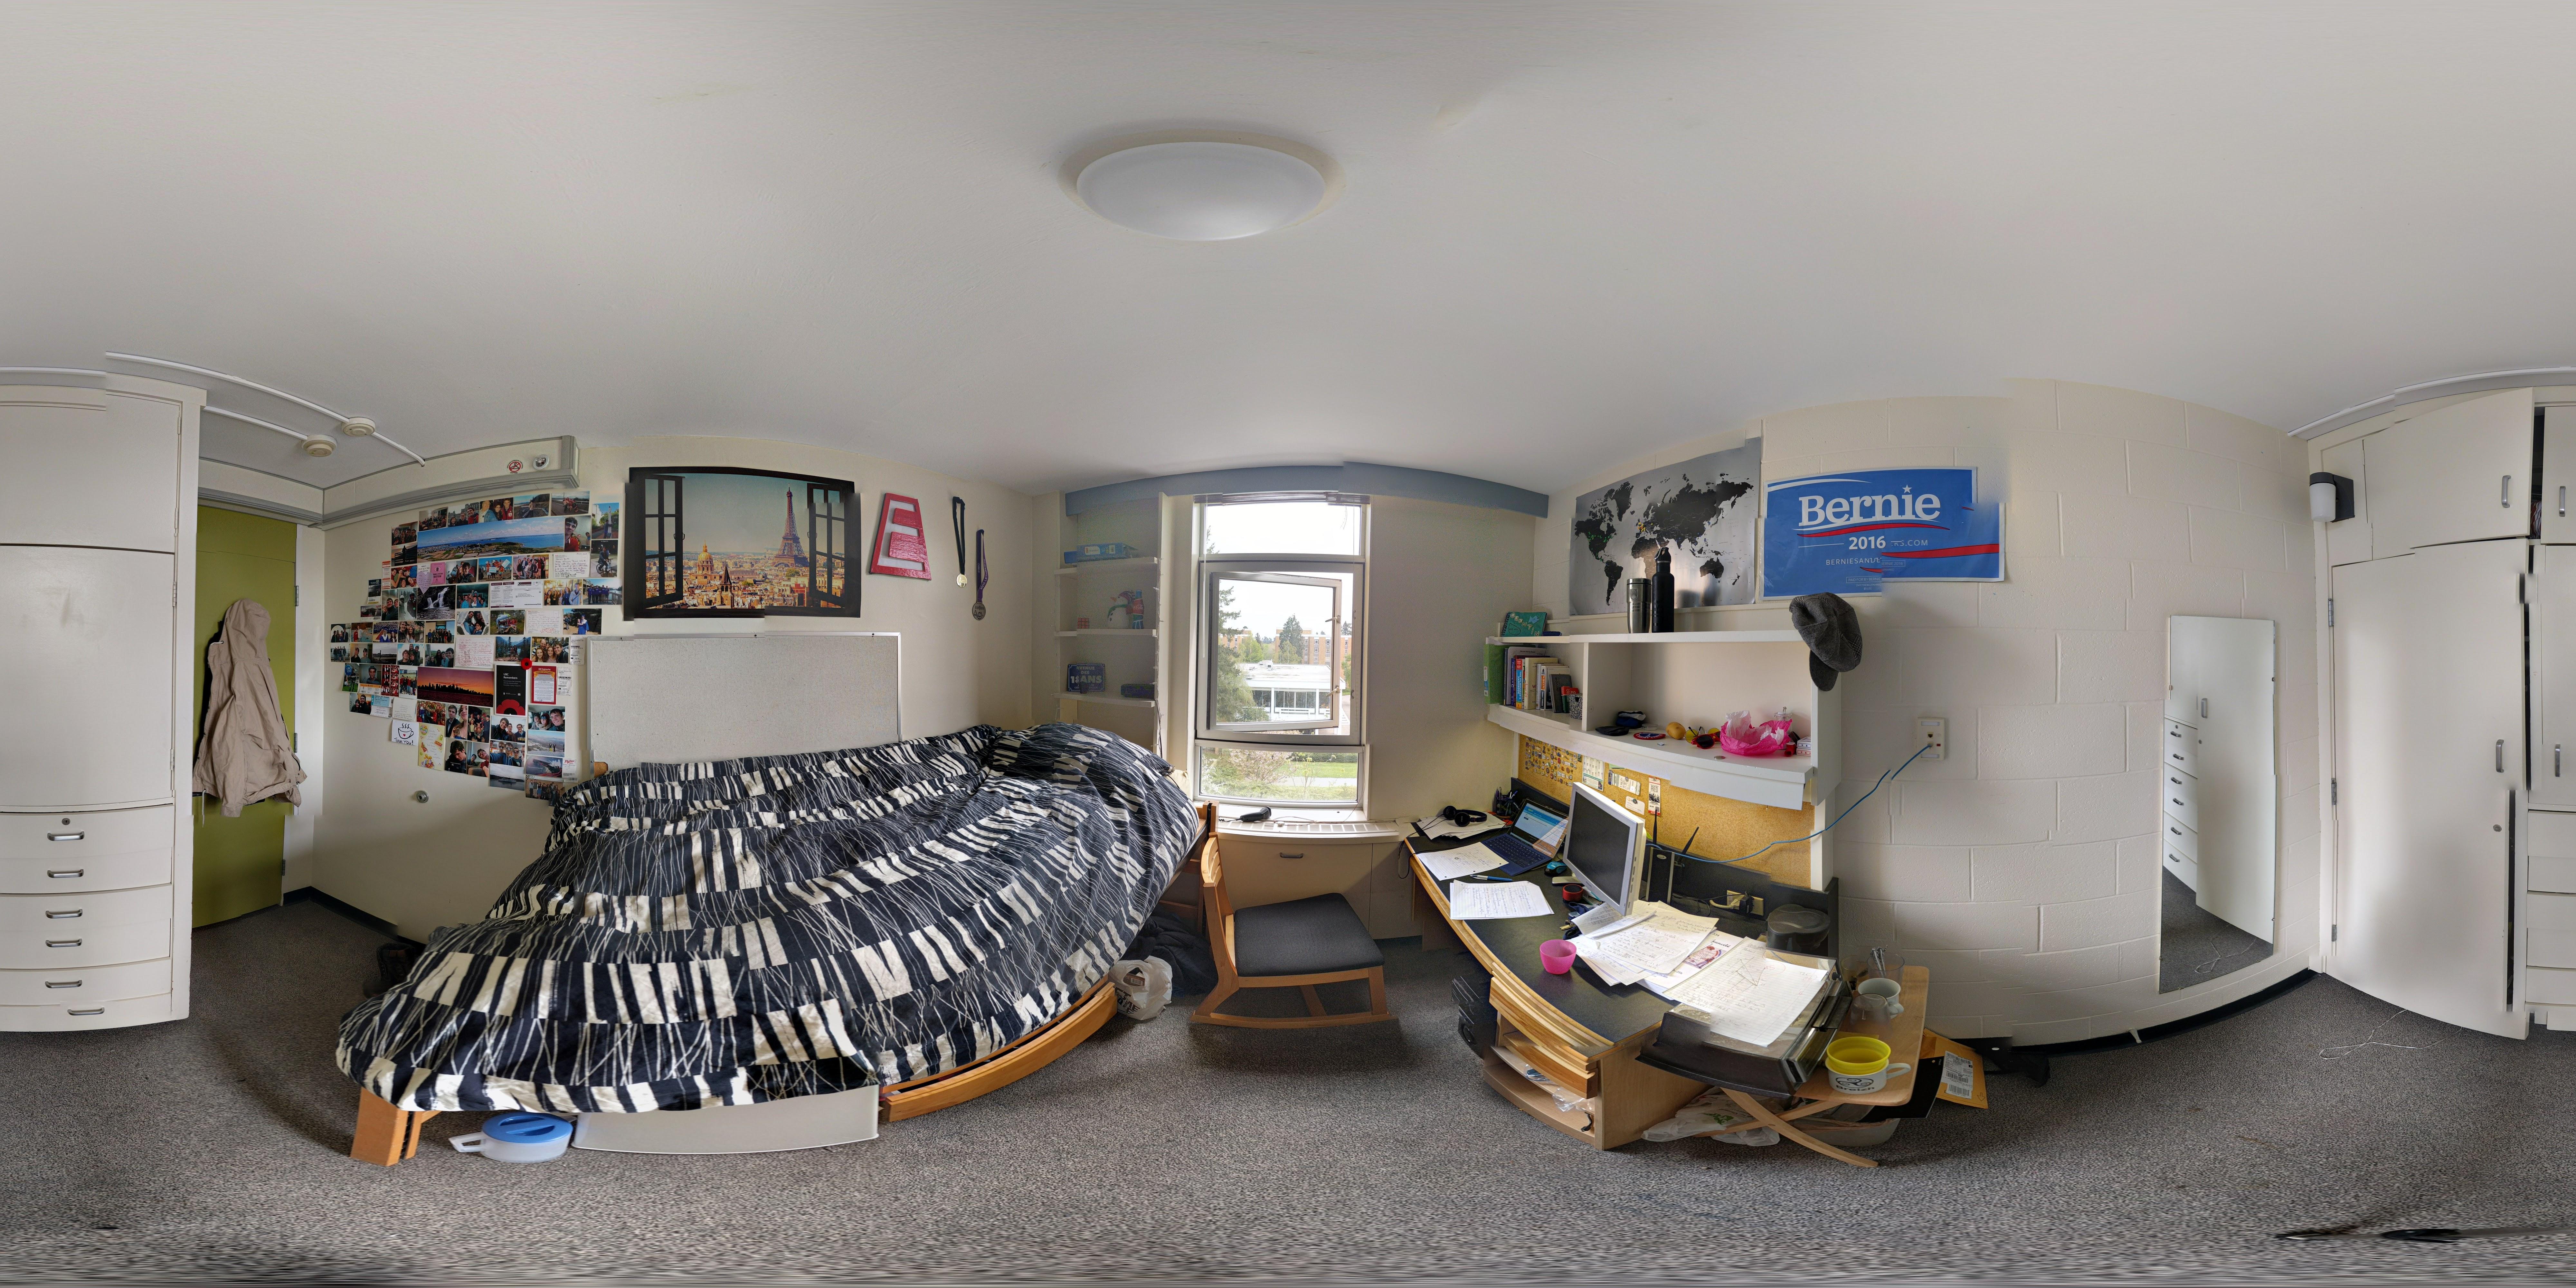 Totem Park residence room.